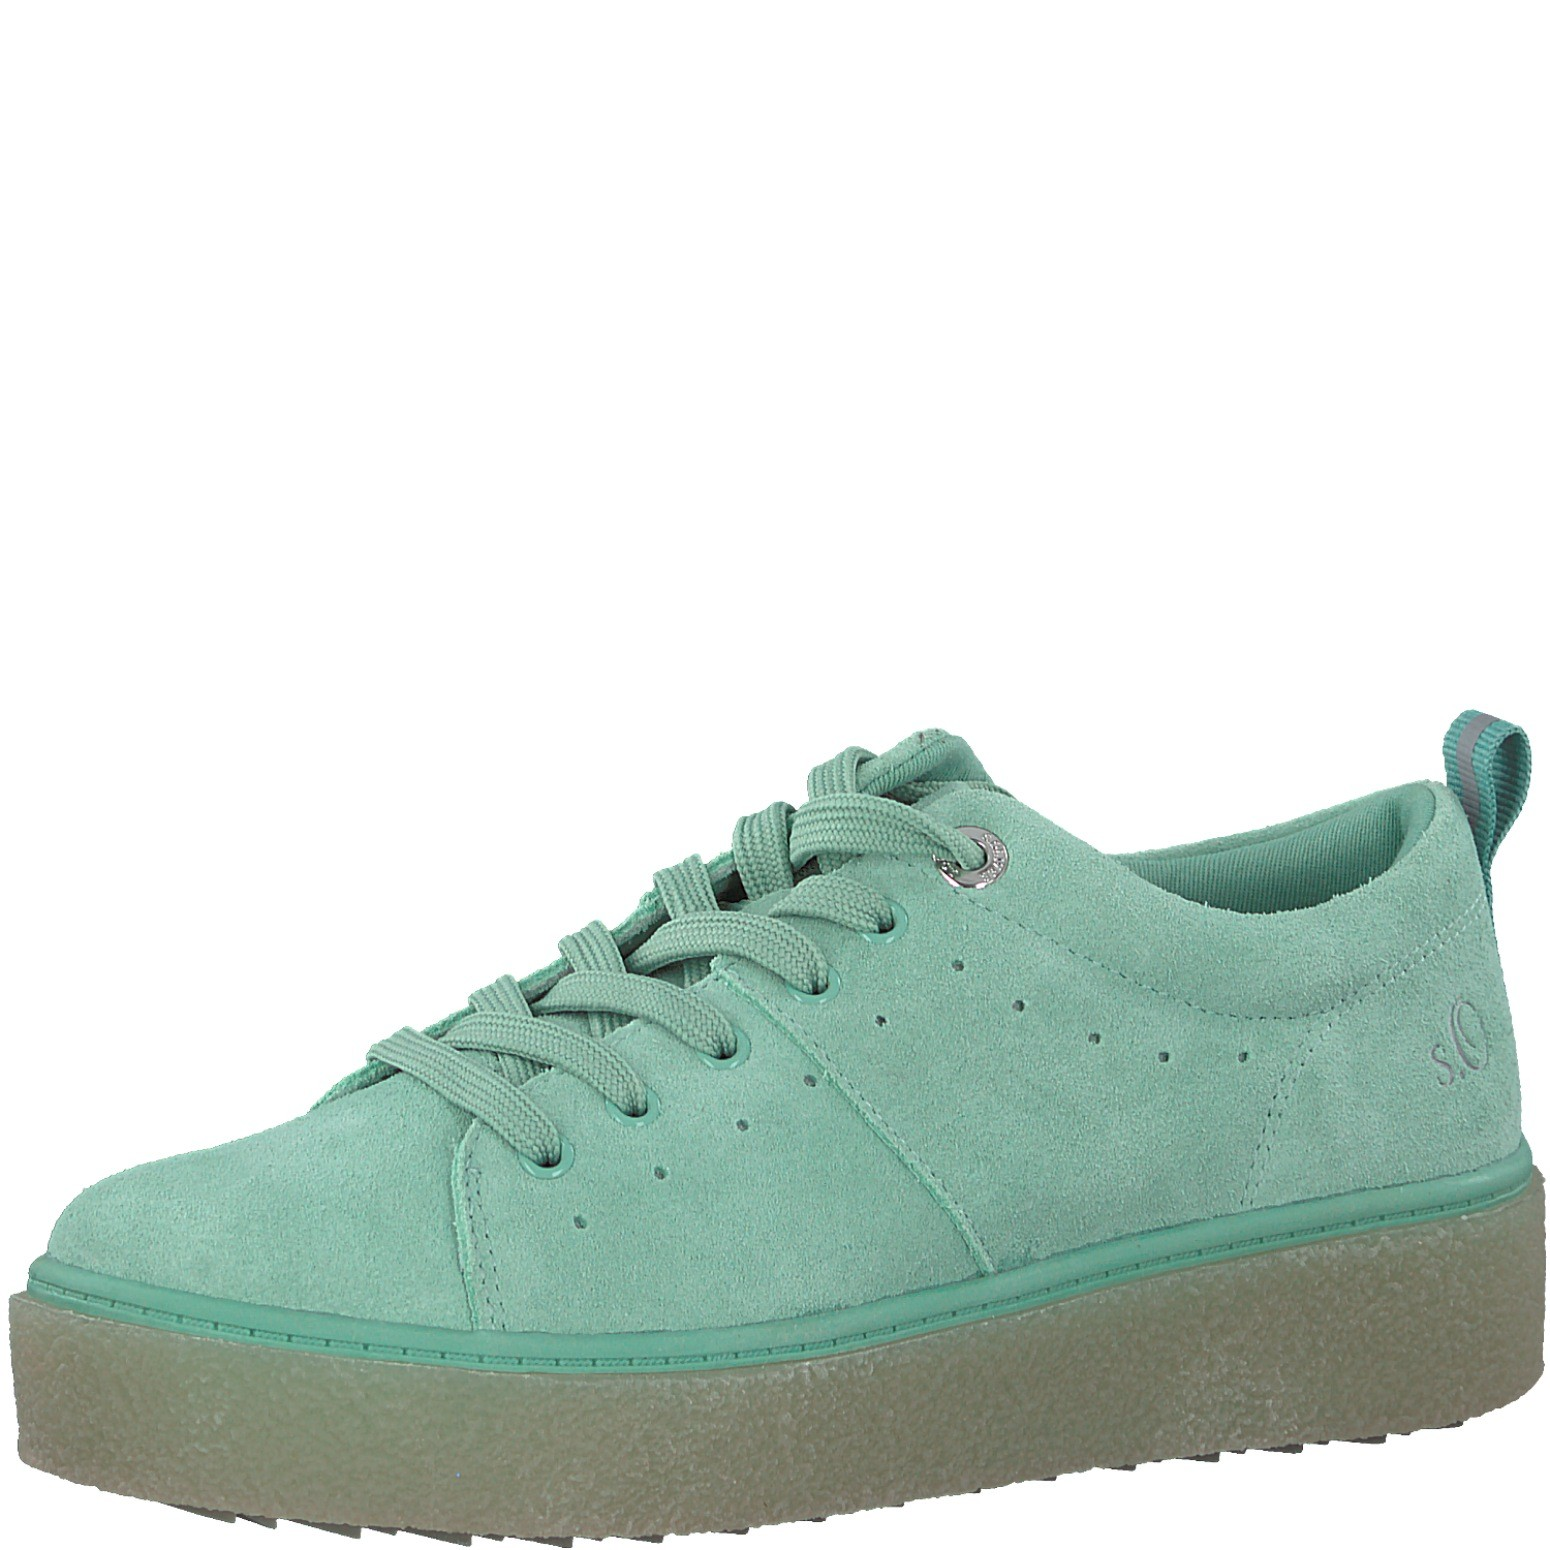 Xarashoes Pantofi femei S.Oliver 5-5-23629-20 703 Mint 1